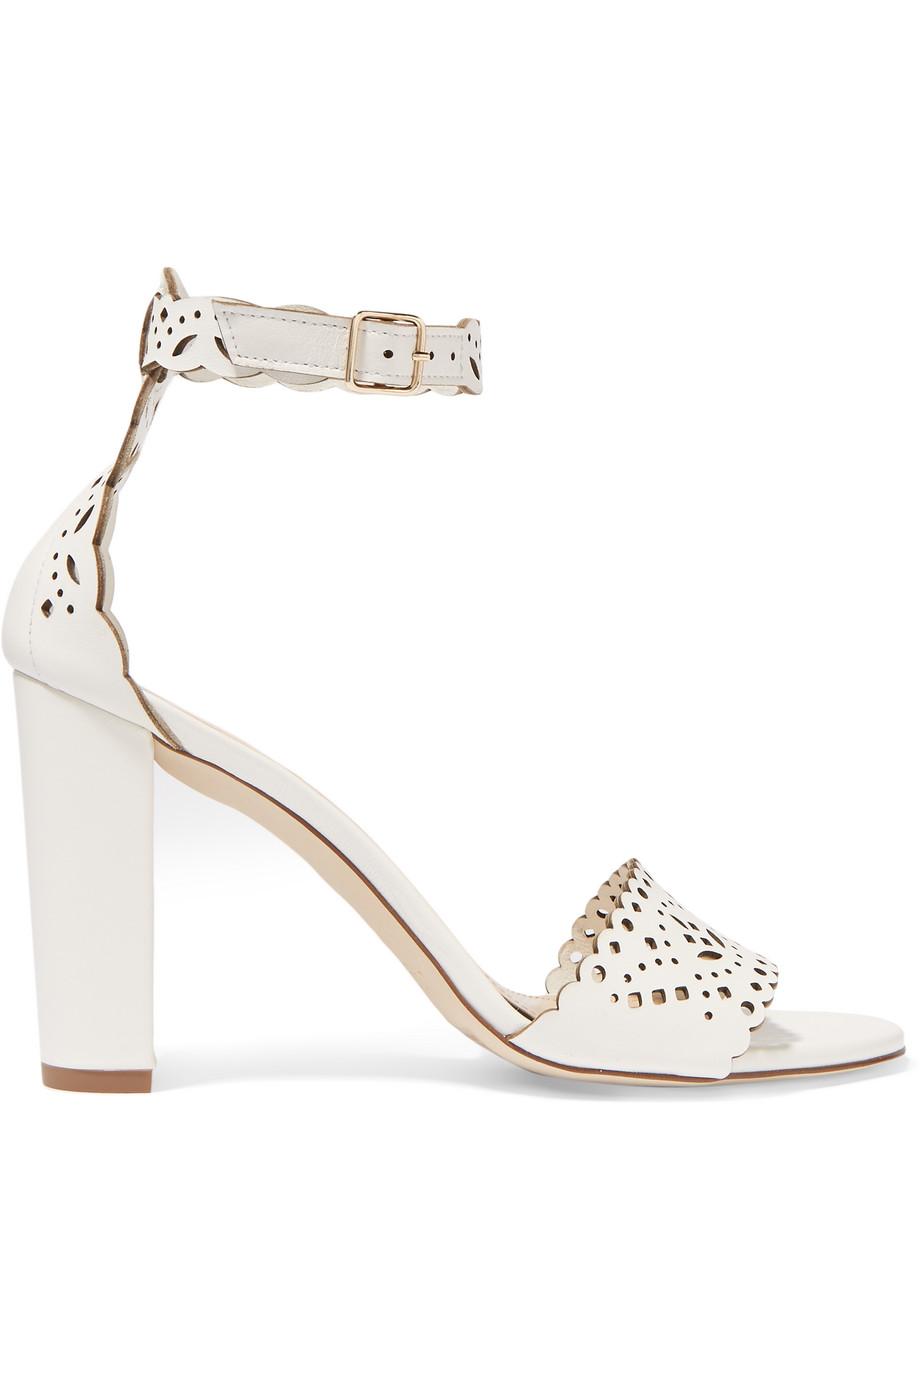 J.Crew Charlotte Laser-Cut Leather Sandals, White, Women's, Size: 5.5